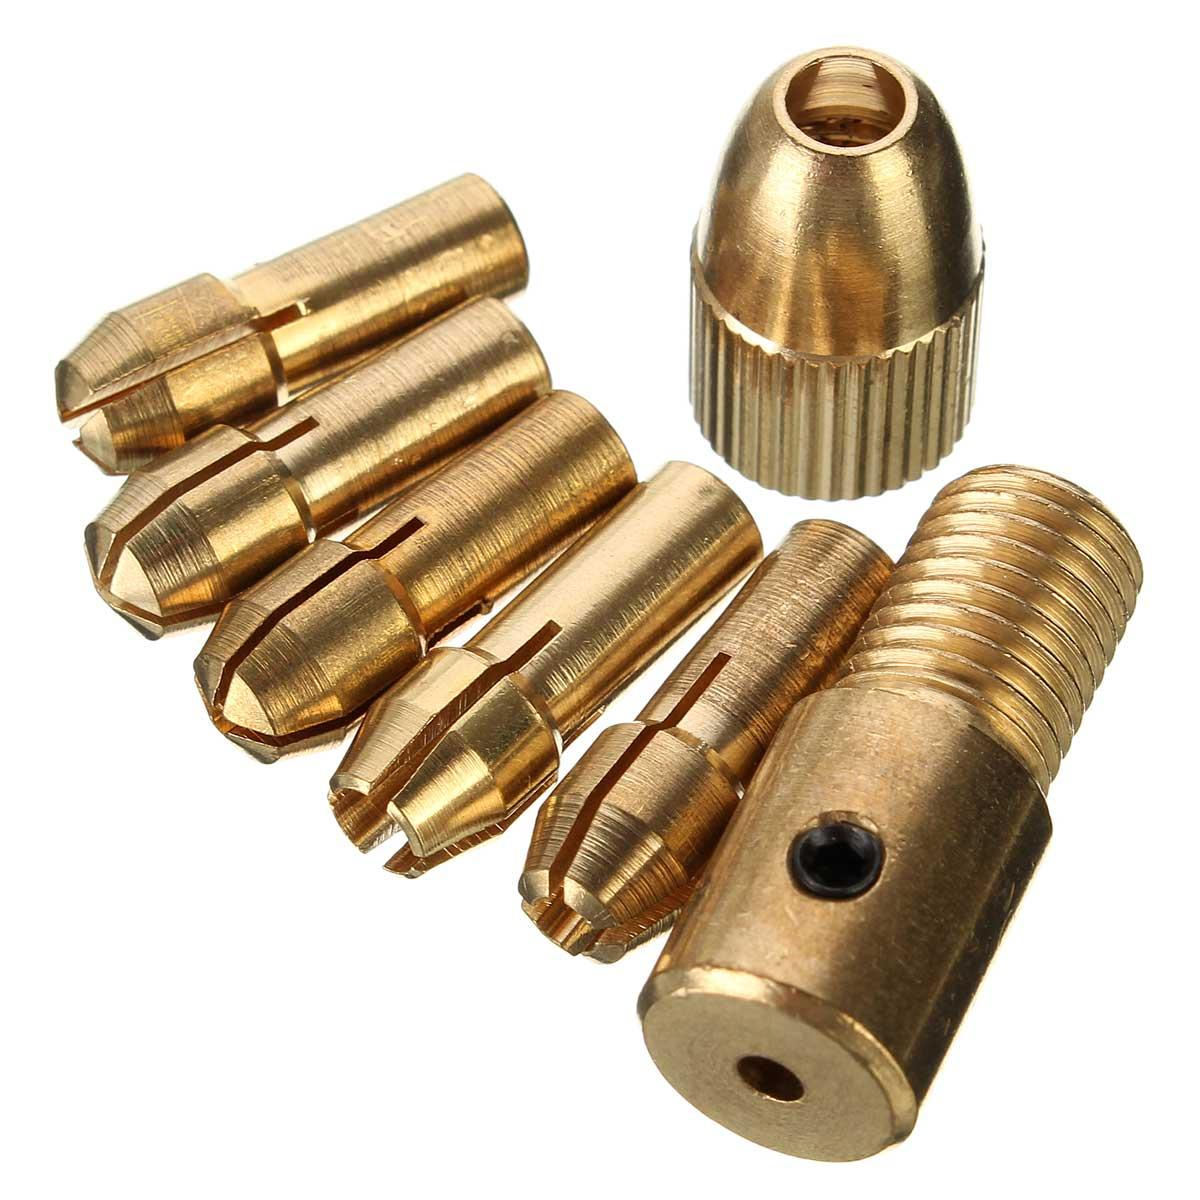 8 adet 0.5-3mm Mikro Büküm Matkap Chuck Seti Küçük elektrik Matkap Bit Collet Allen anahtarı ile